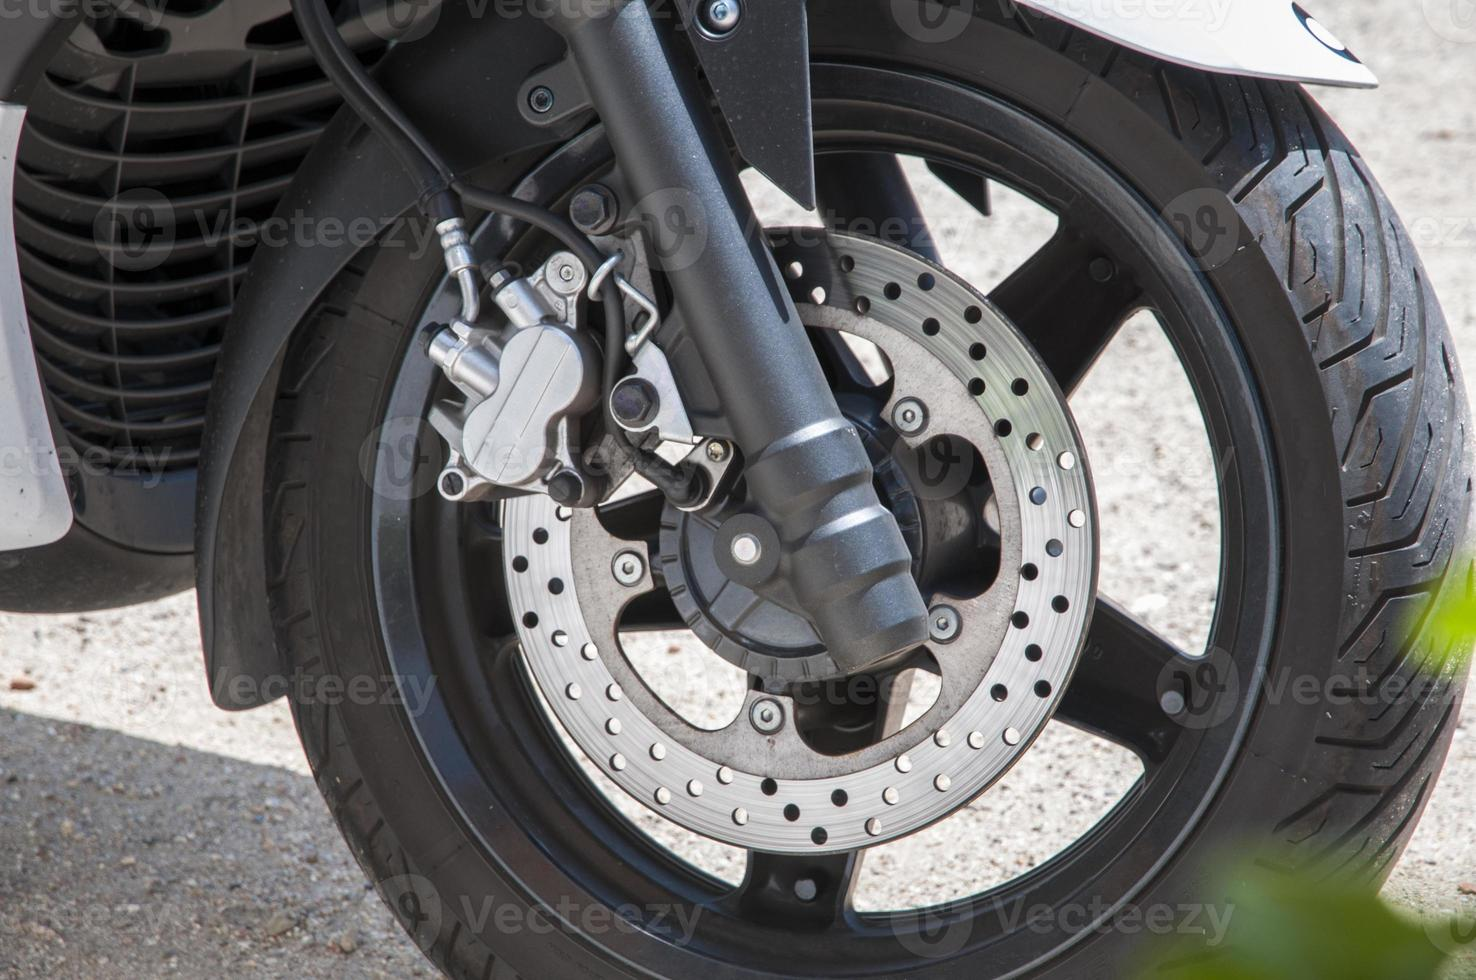 motocicleta de freno de disco foto